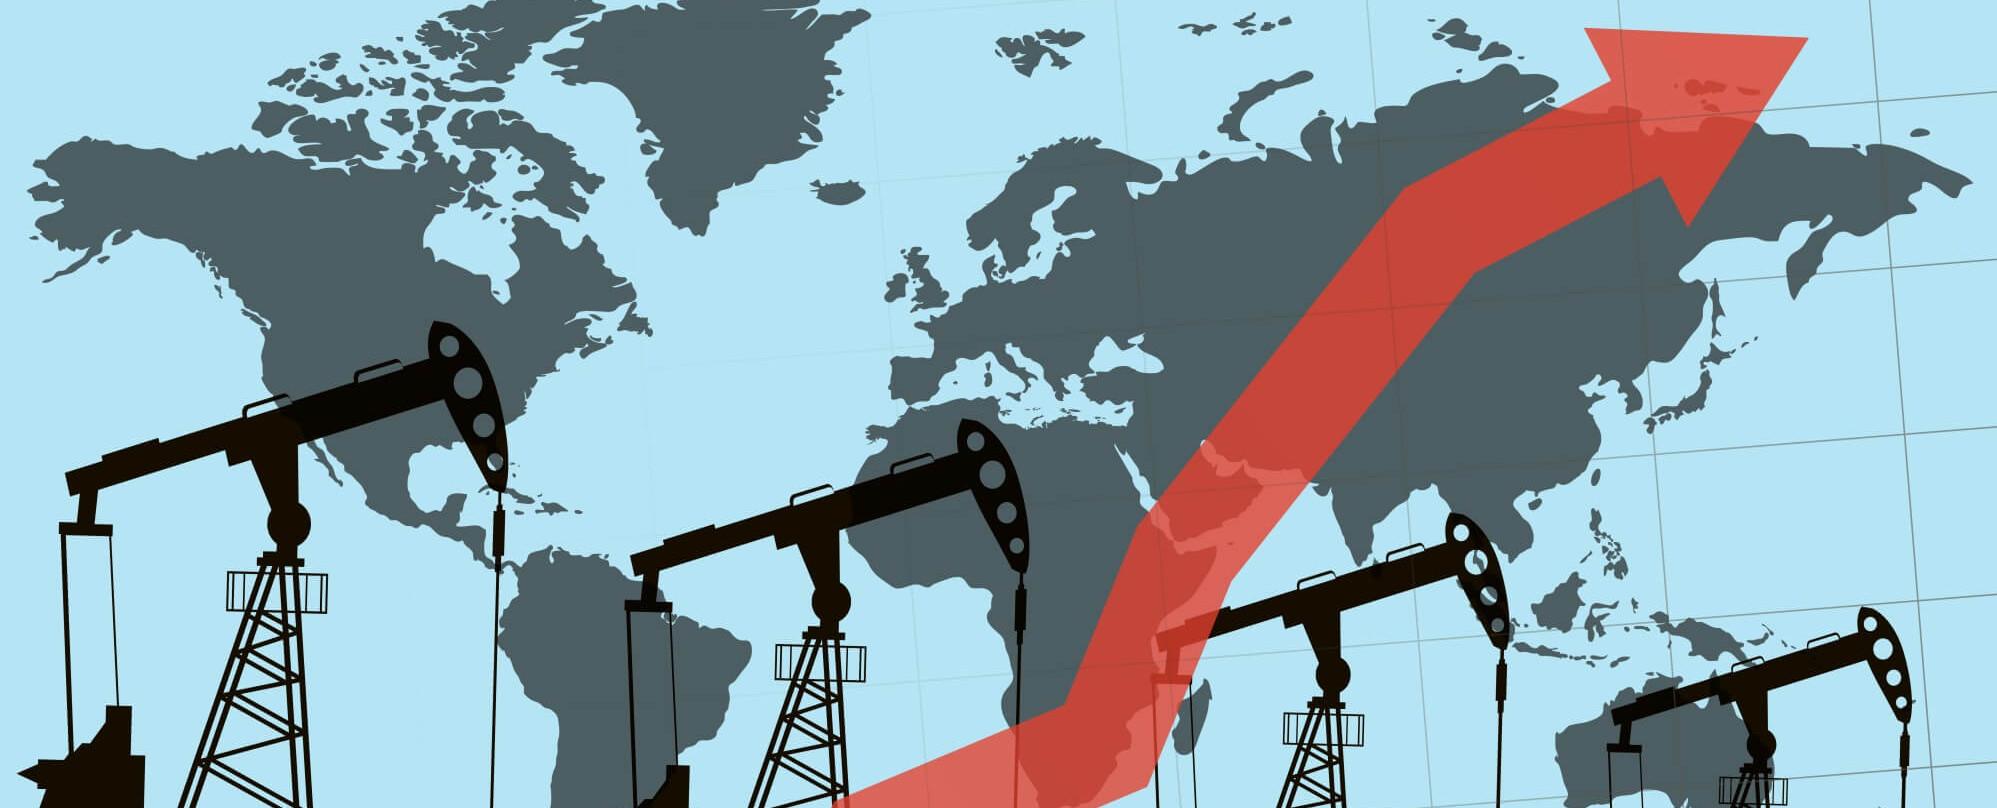 Oil price pass-through to consumer prices in Latvia